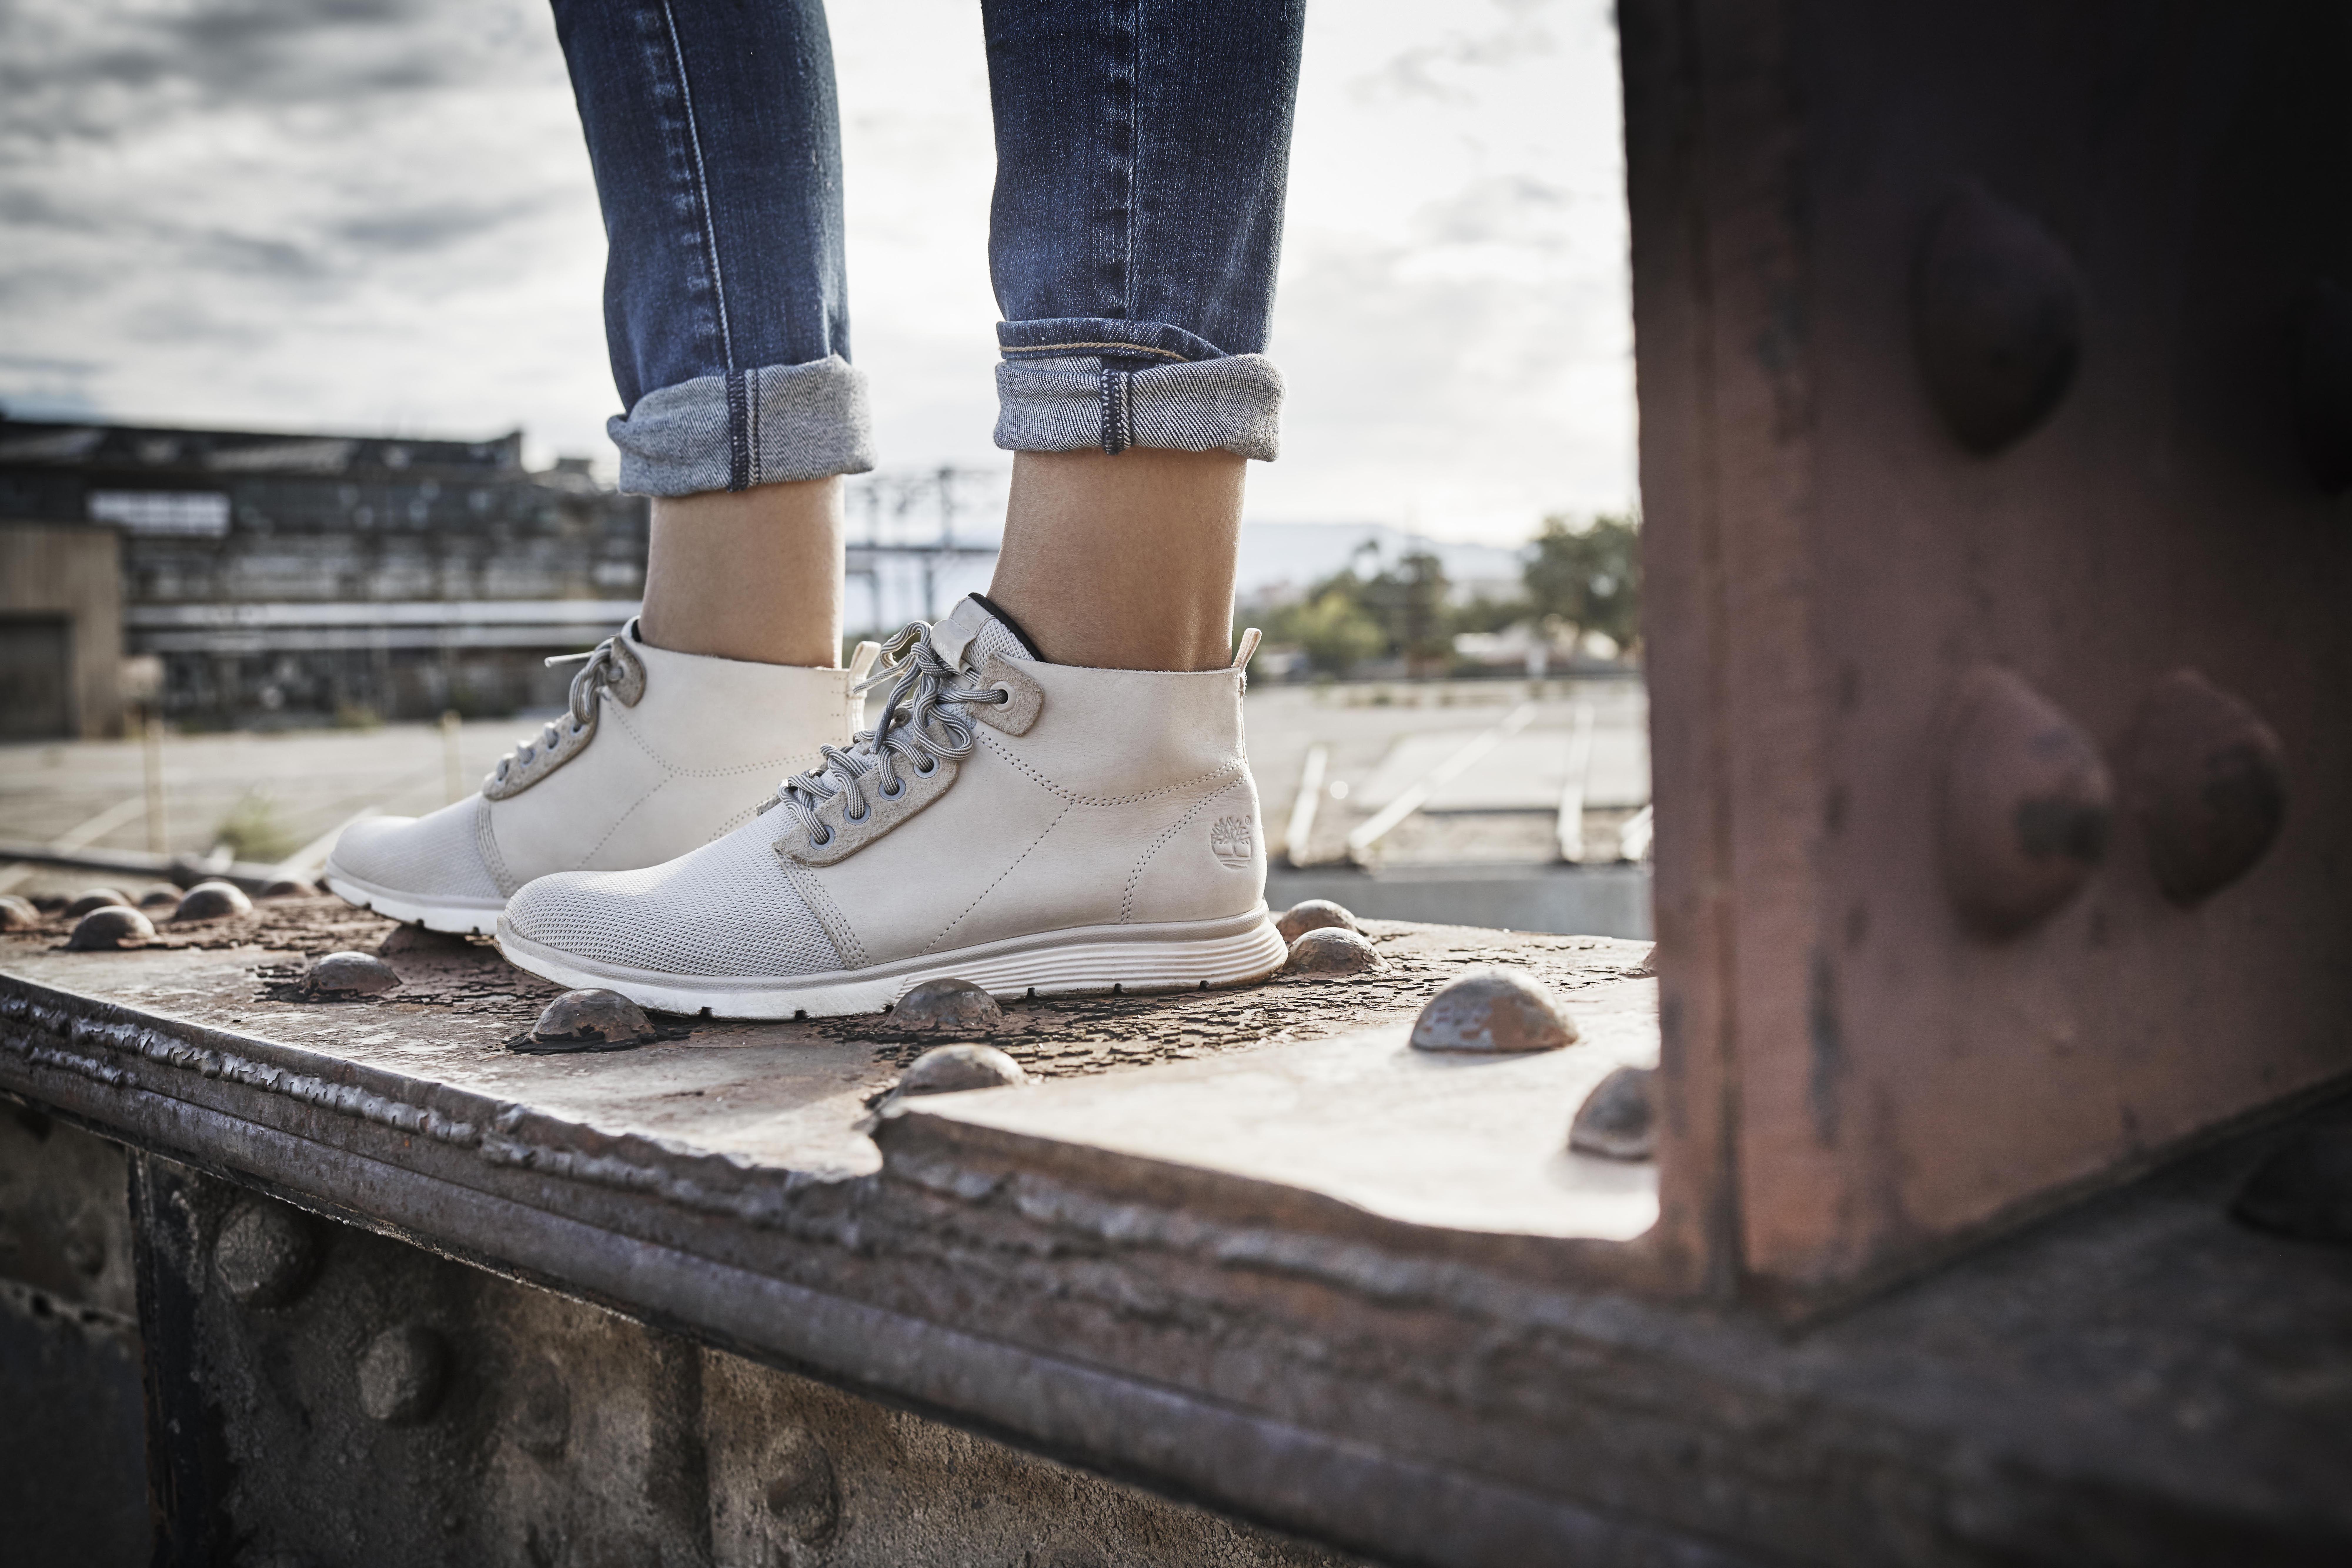 637863ef89c Women's Killington Chukka Sneaker Boots | Crisp & Cool | Chukka ...